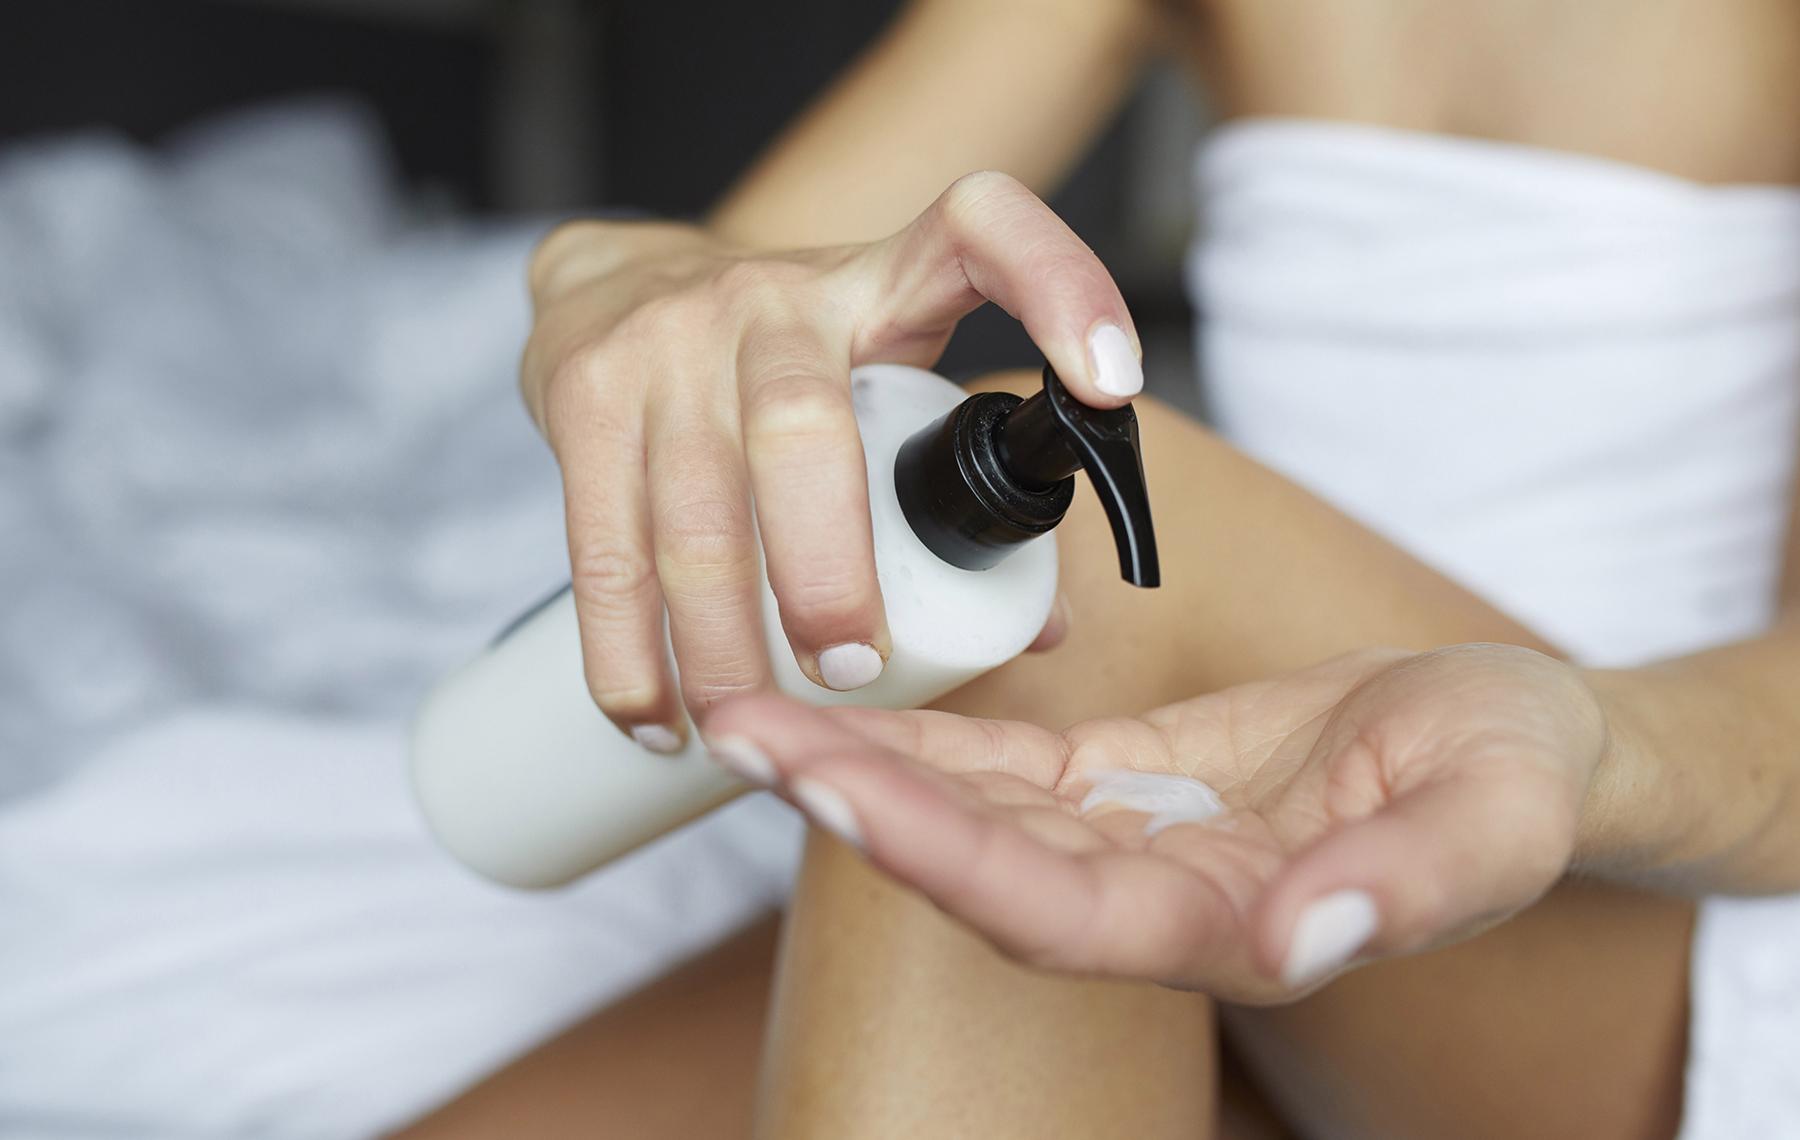 Woman Putting Moisturizing Cream On Her Hand